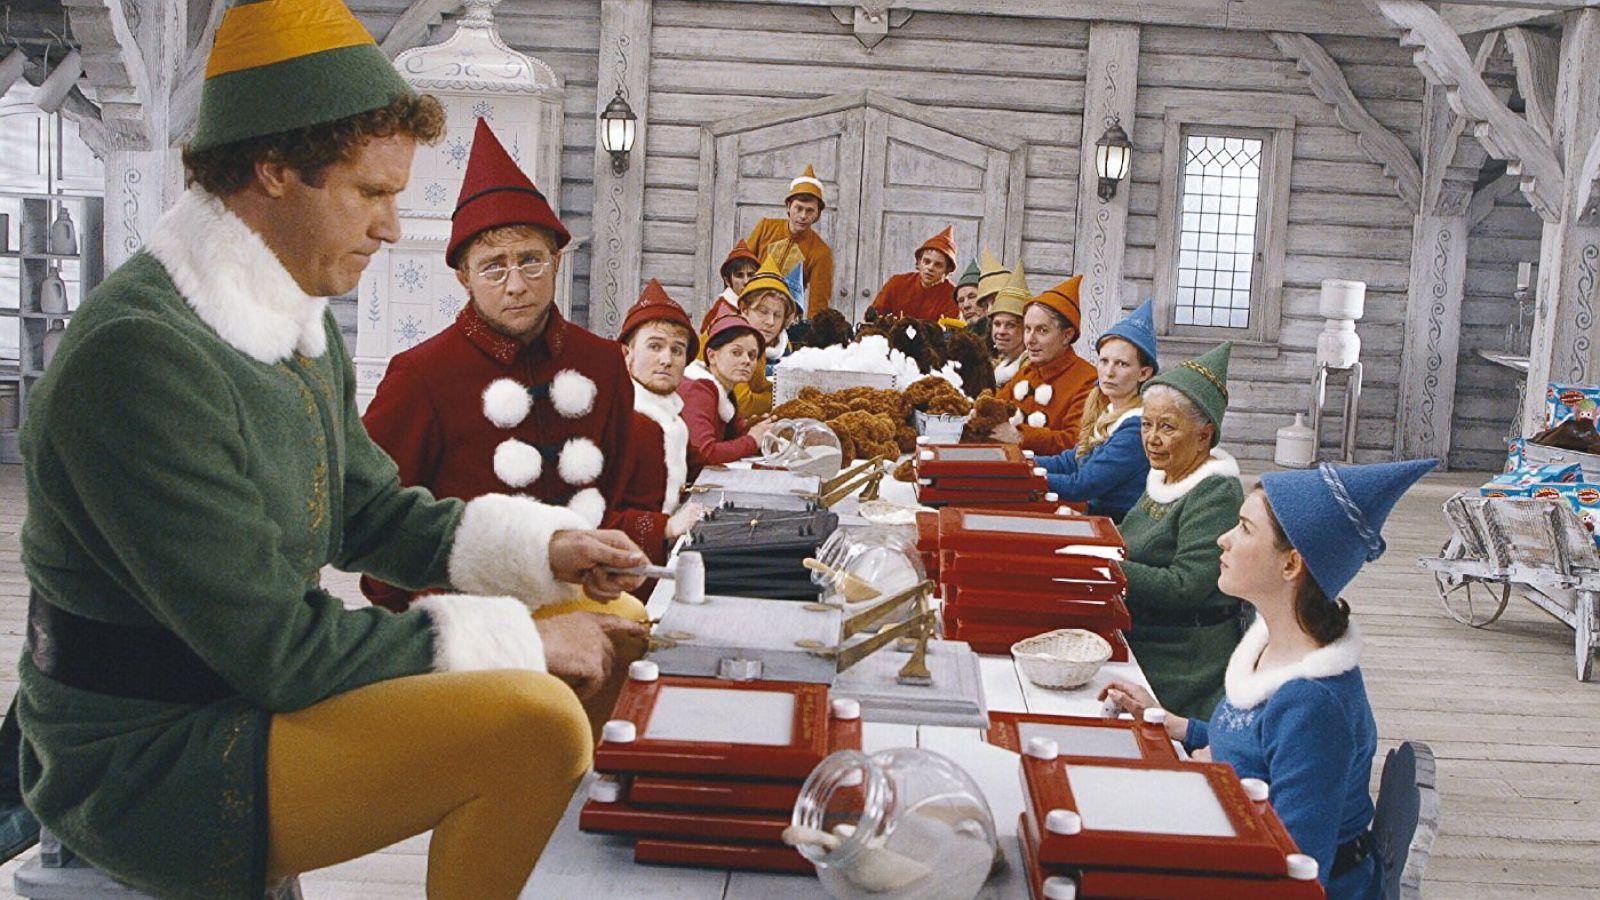 Will Ferrell in movie Elf